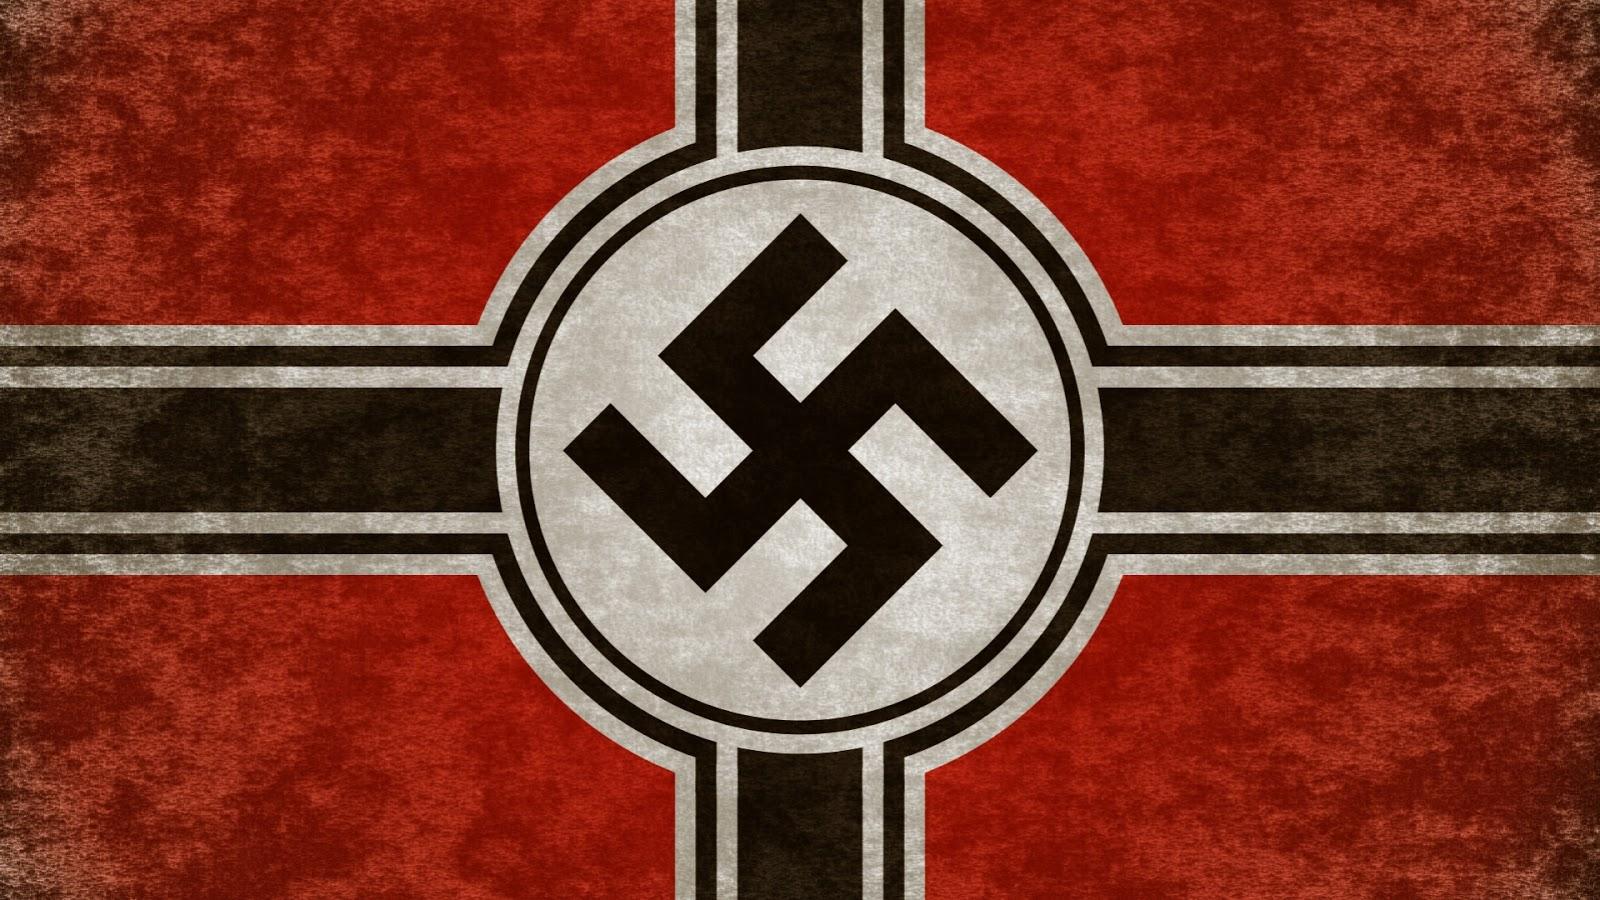 Russians Adore Soviet Symbols And Despise The Swastika